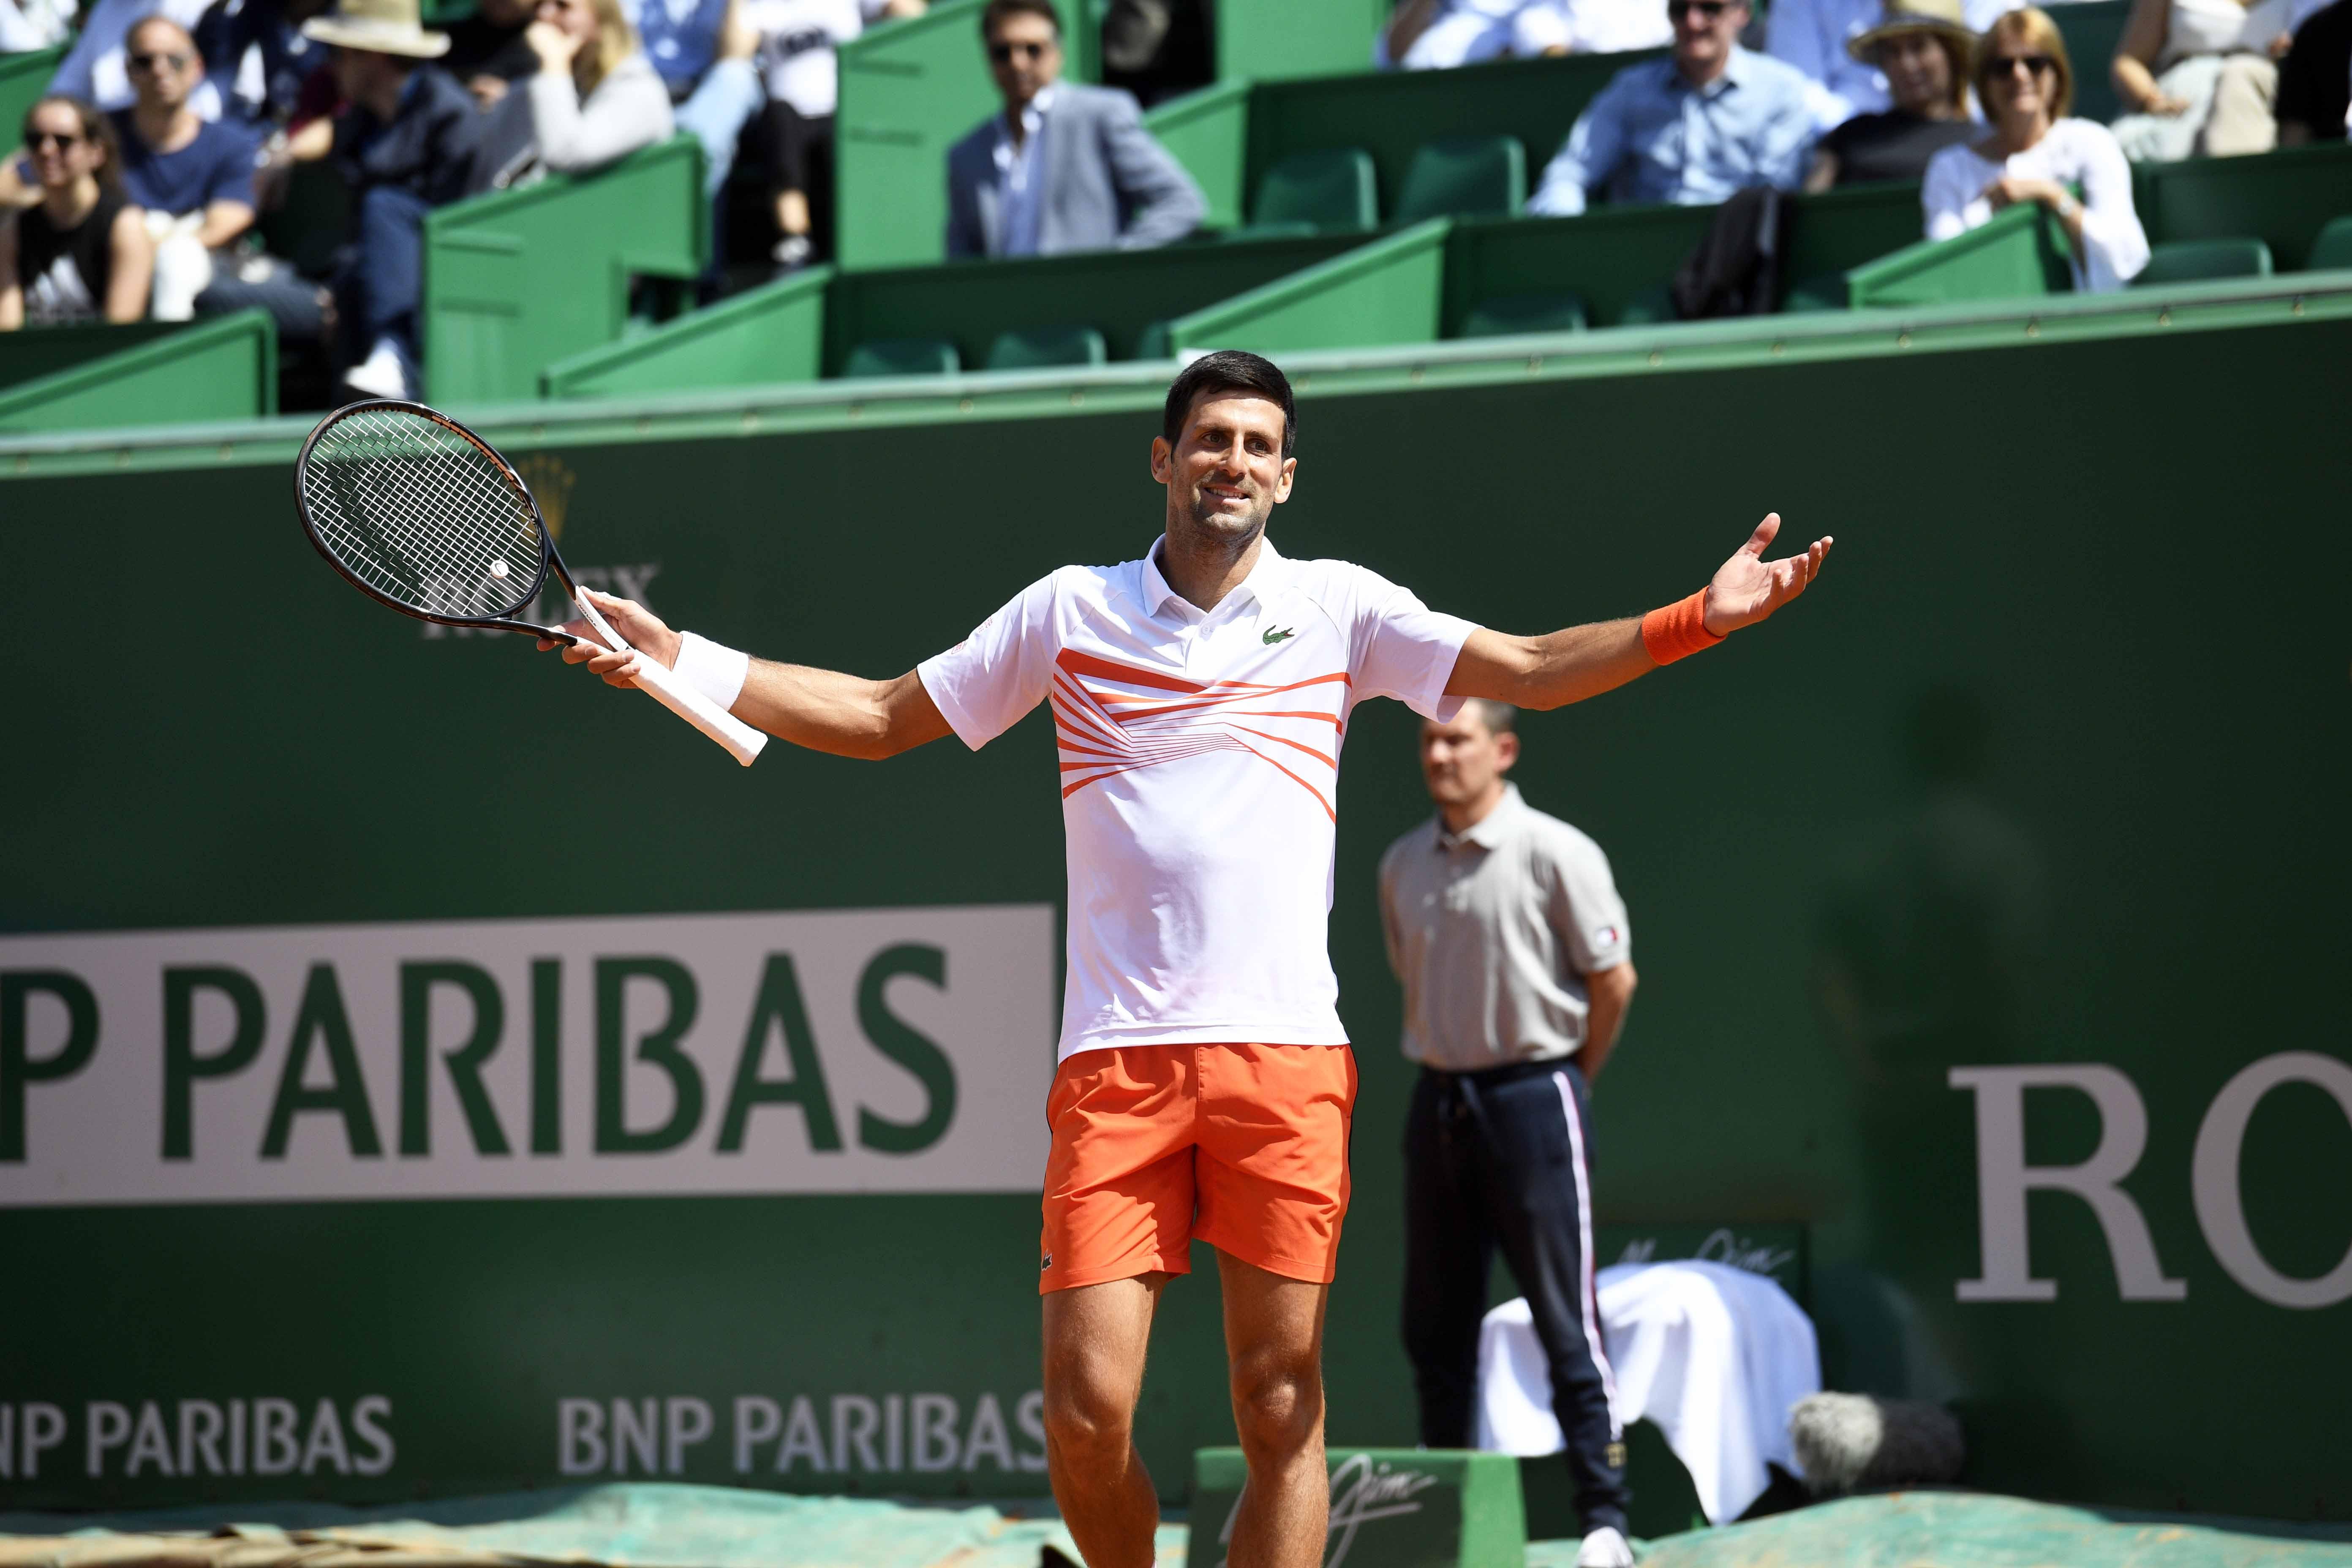 Novak Djokovic getting a bit upset during Monte-Carlo 2019